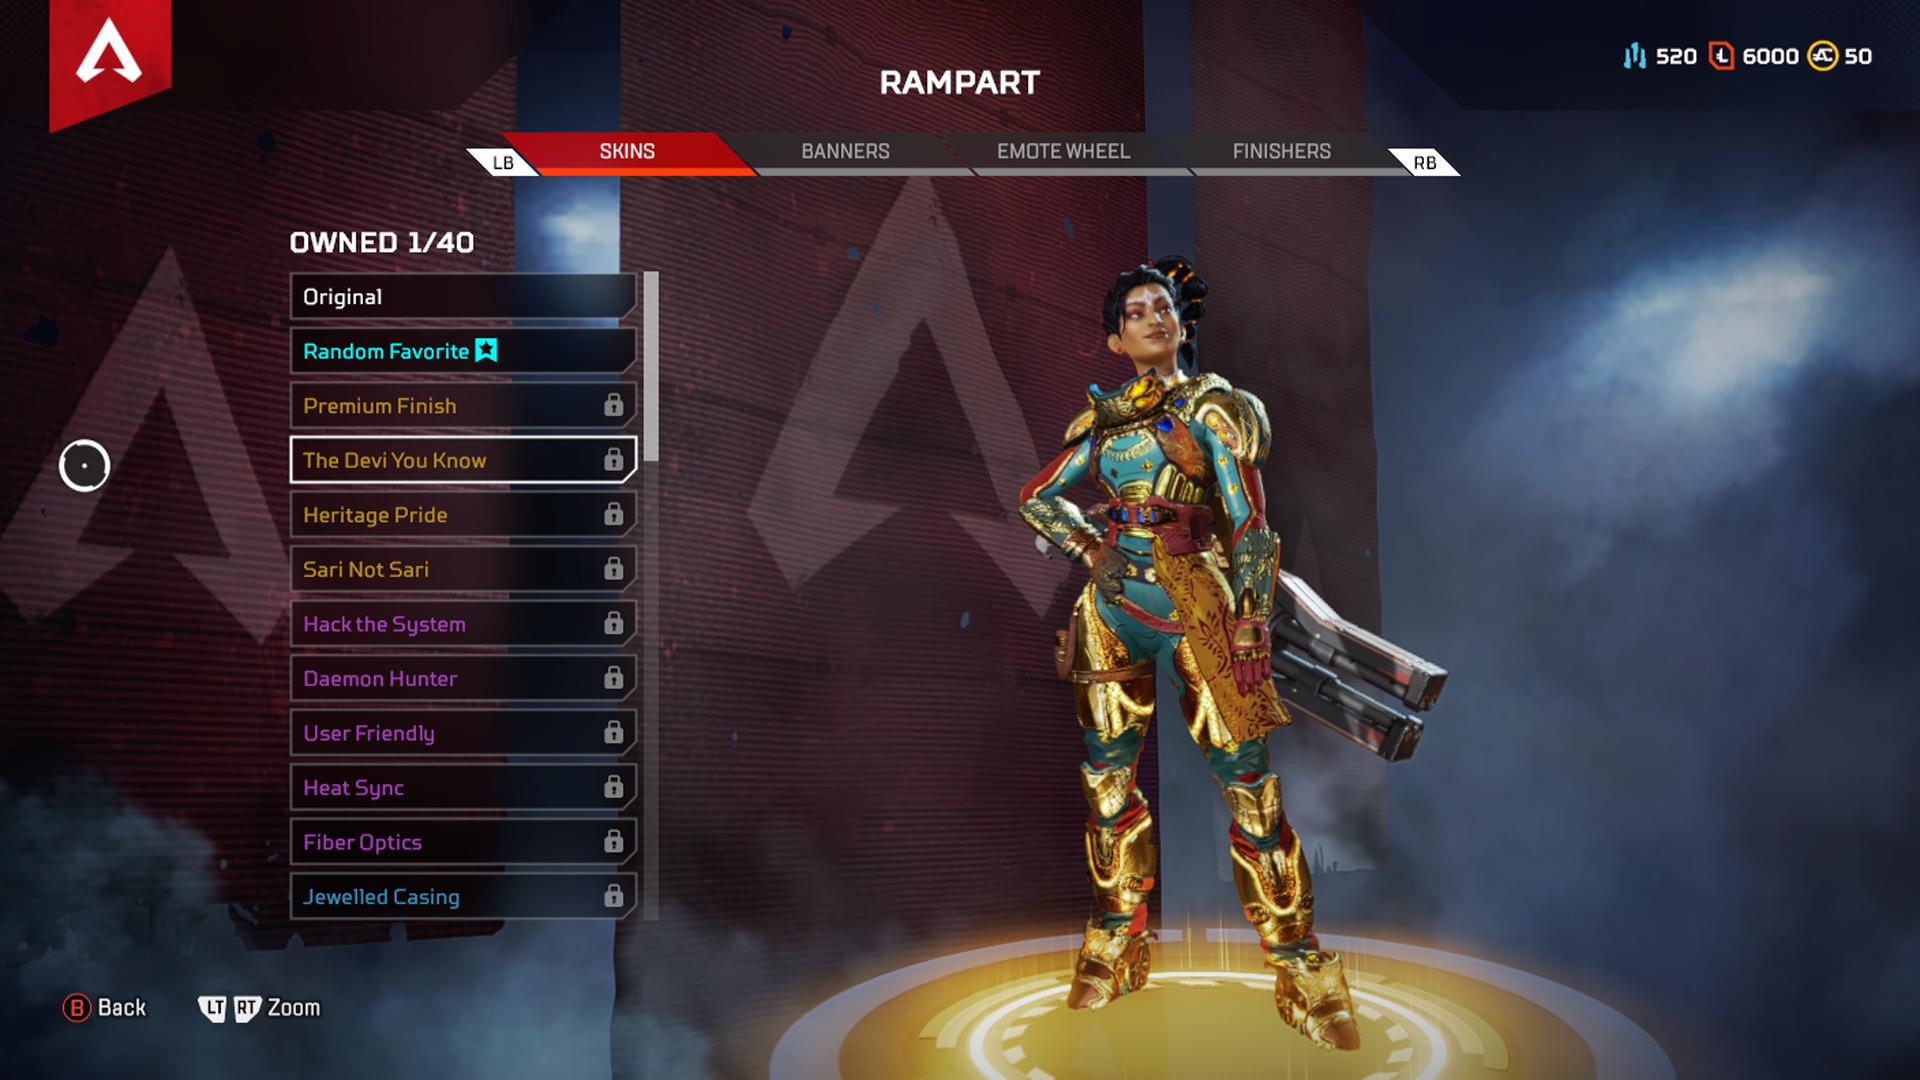 apex legends rempart skins légendaires